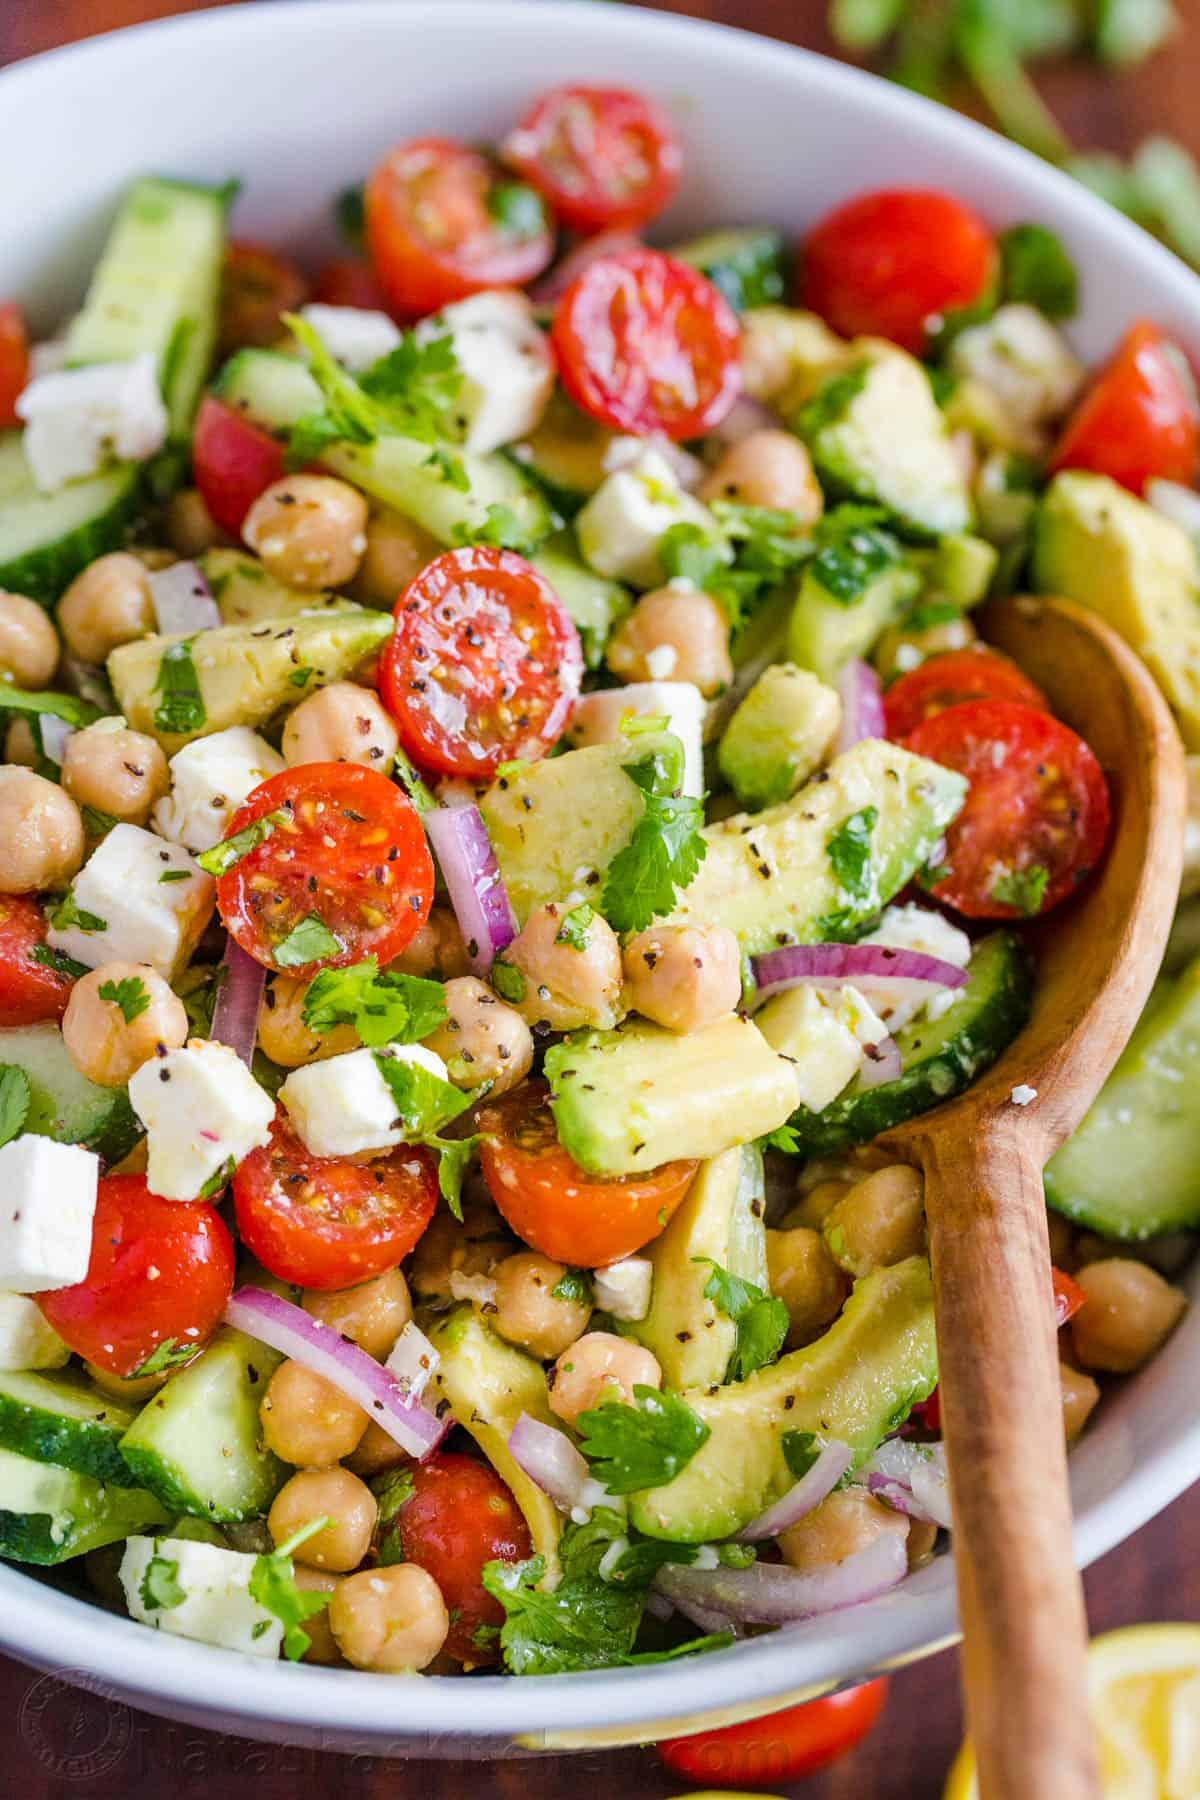 Chickpea Salad with Lemon Dressing